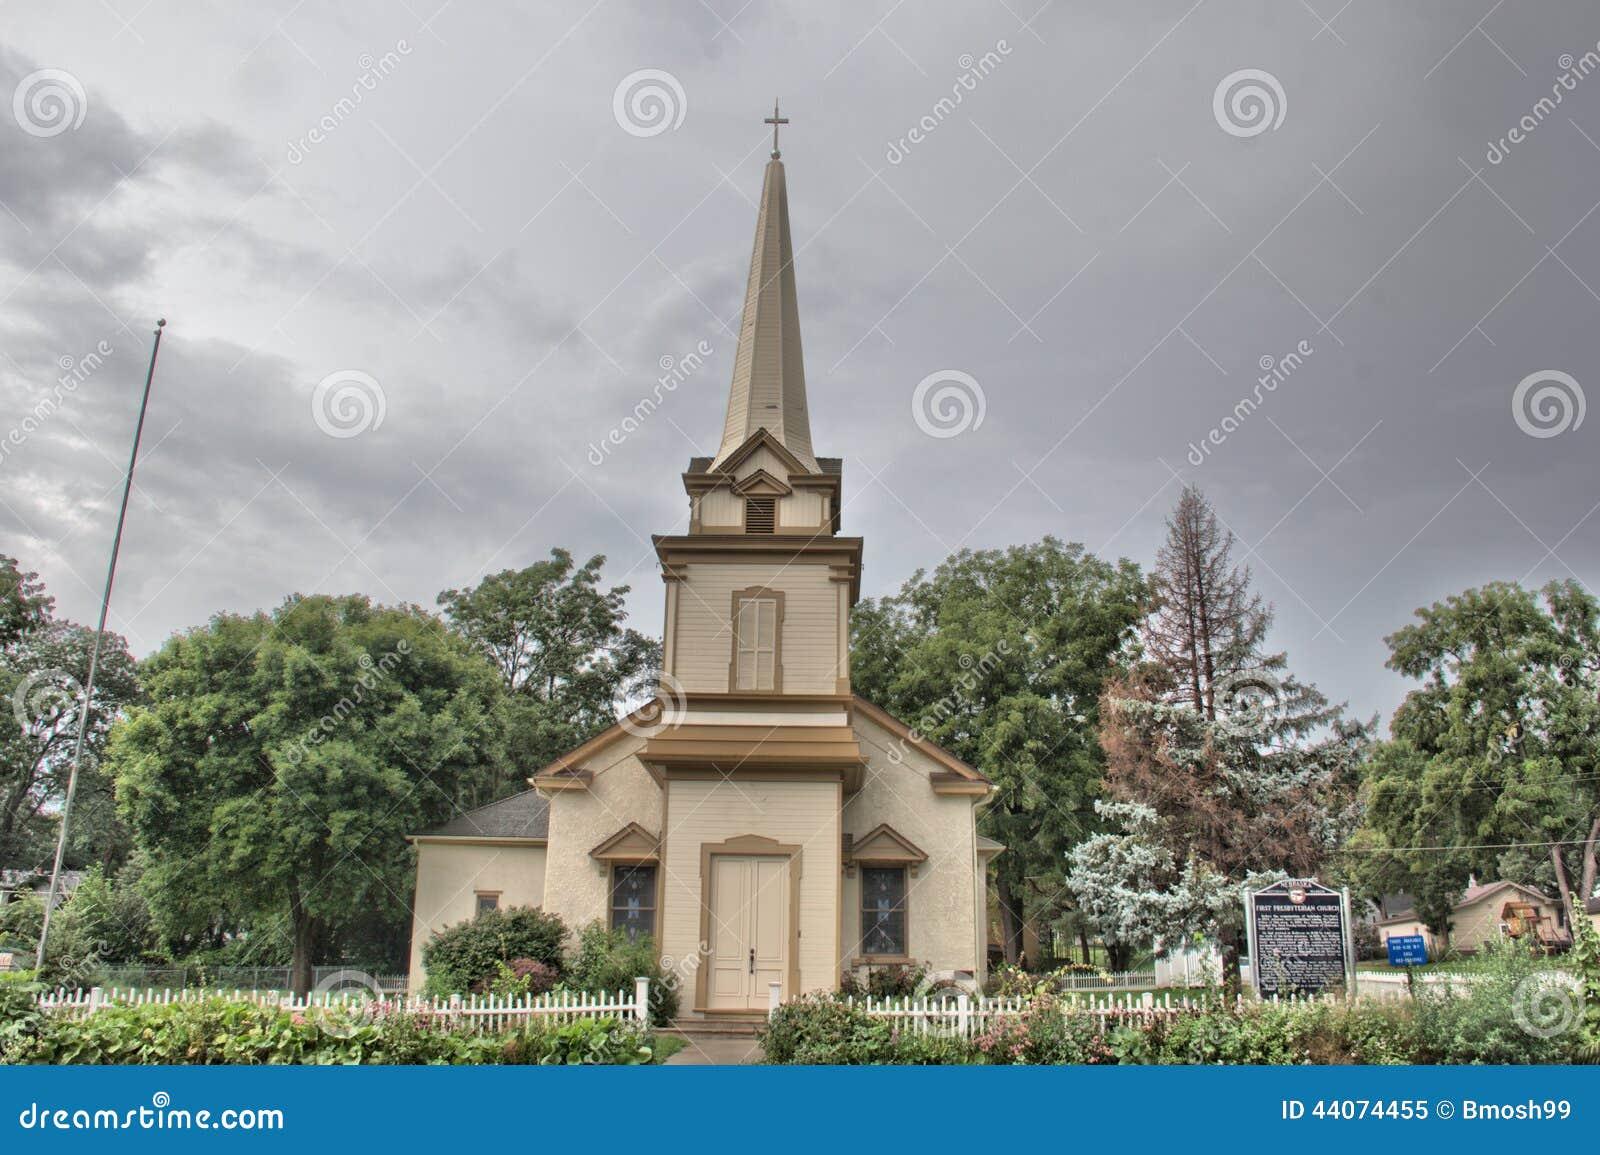 Awesome Bellevue Presbyterian Church #1: First-presbyterian-church-bellevue-ne-was-built-one-oldest-buildings-nebraska-historical-building-44074455.jpg